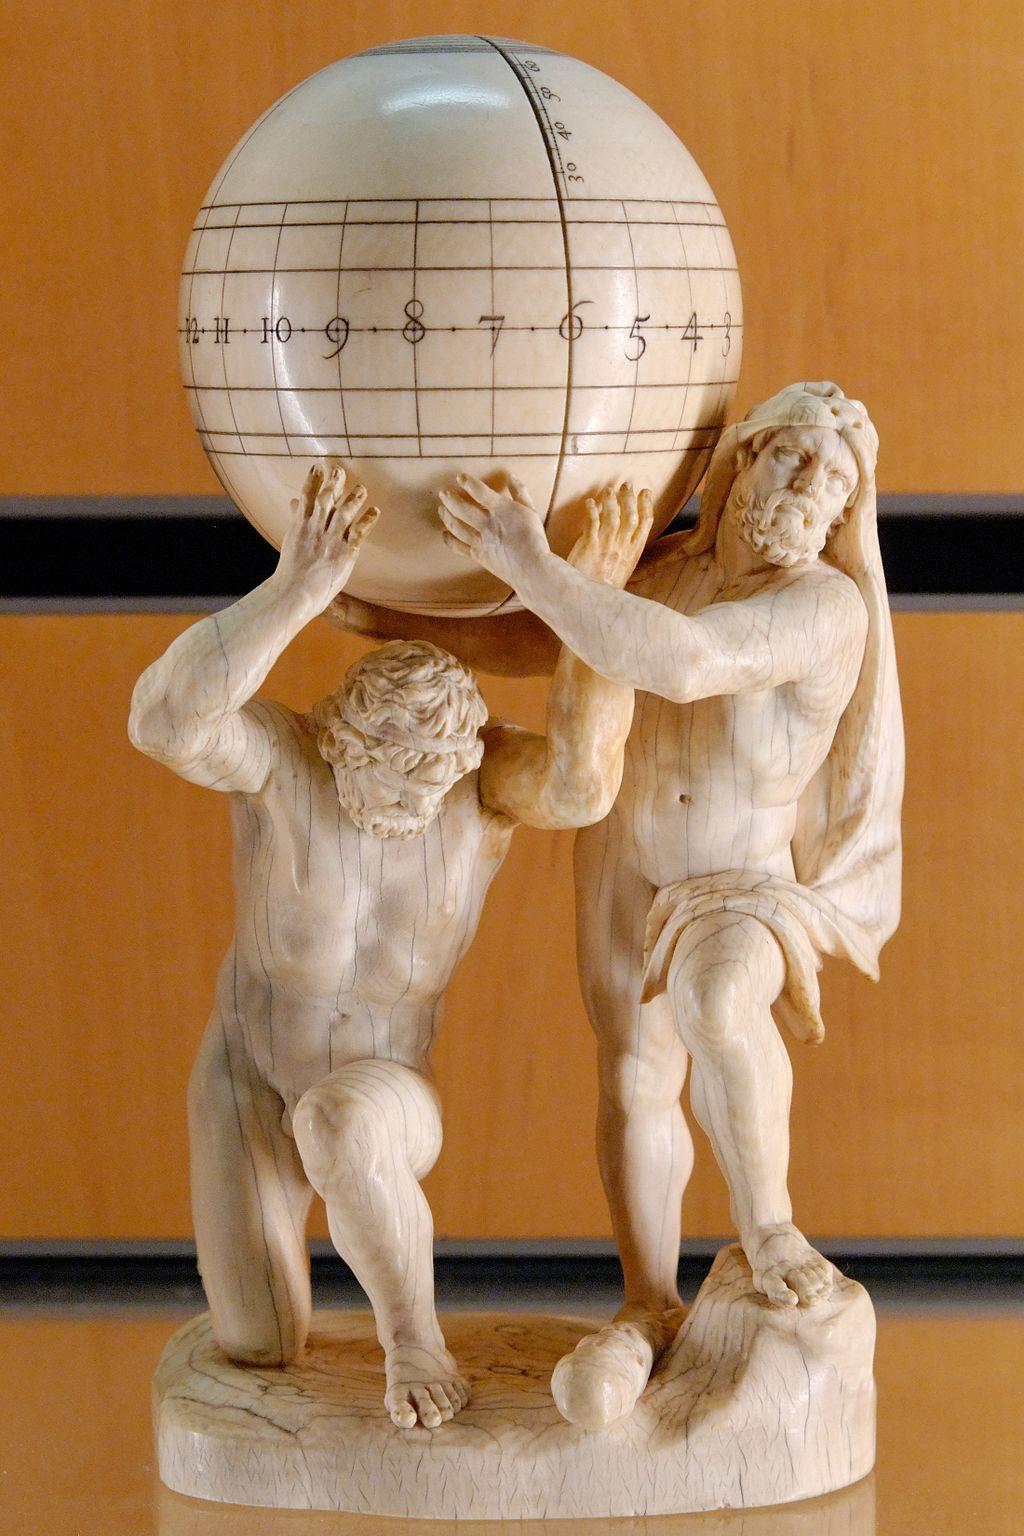 Atlas and Herakles